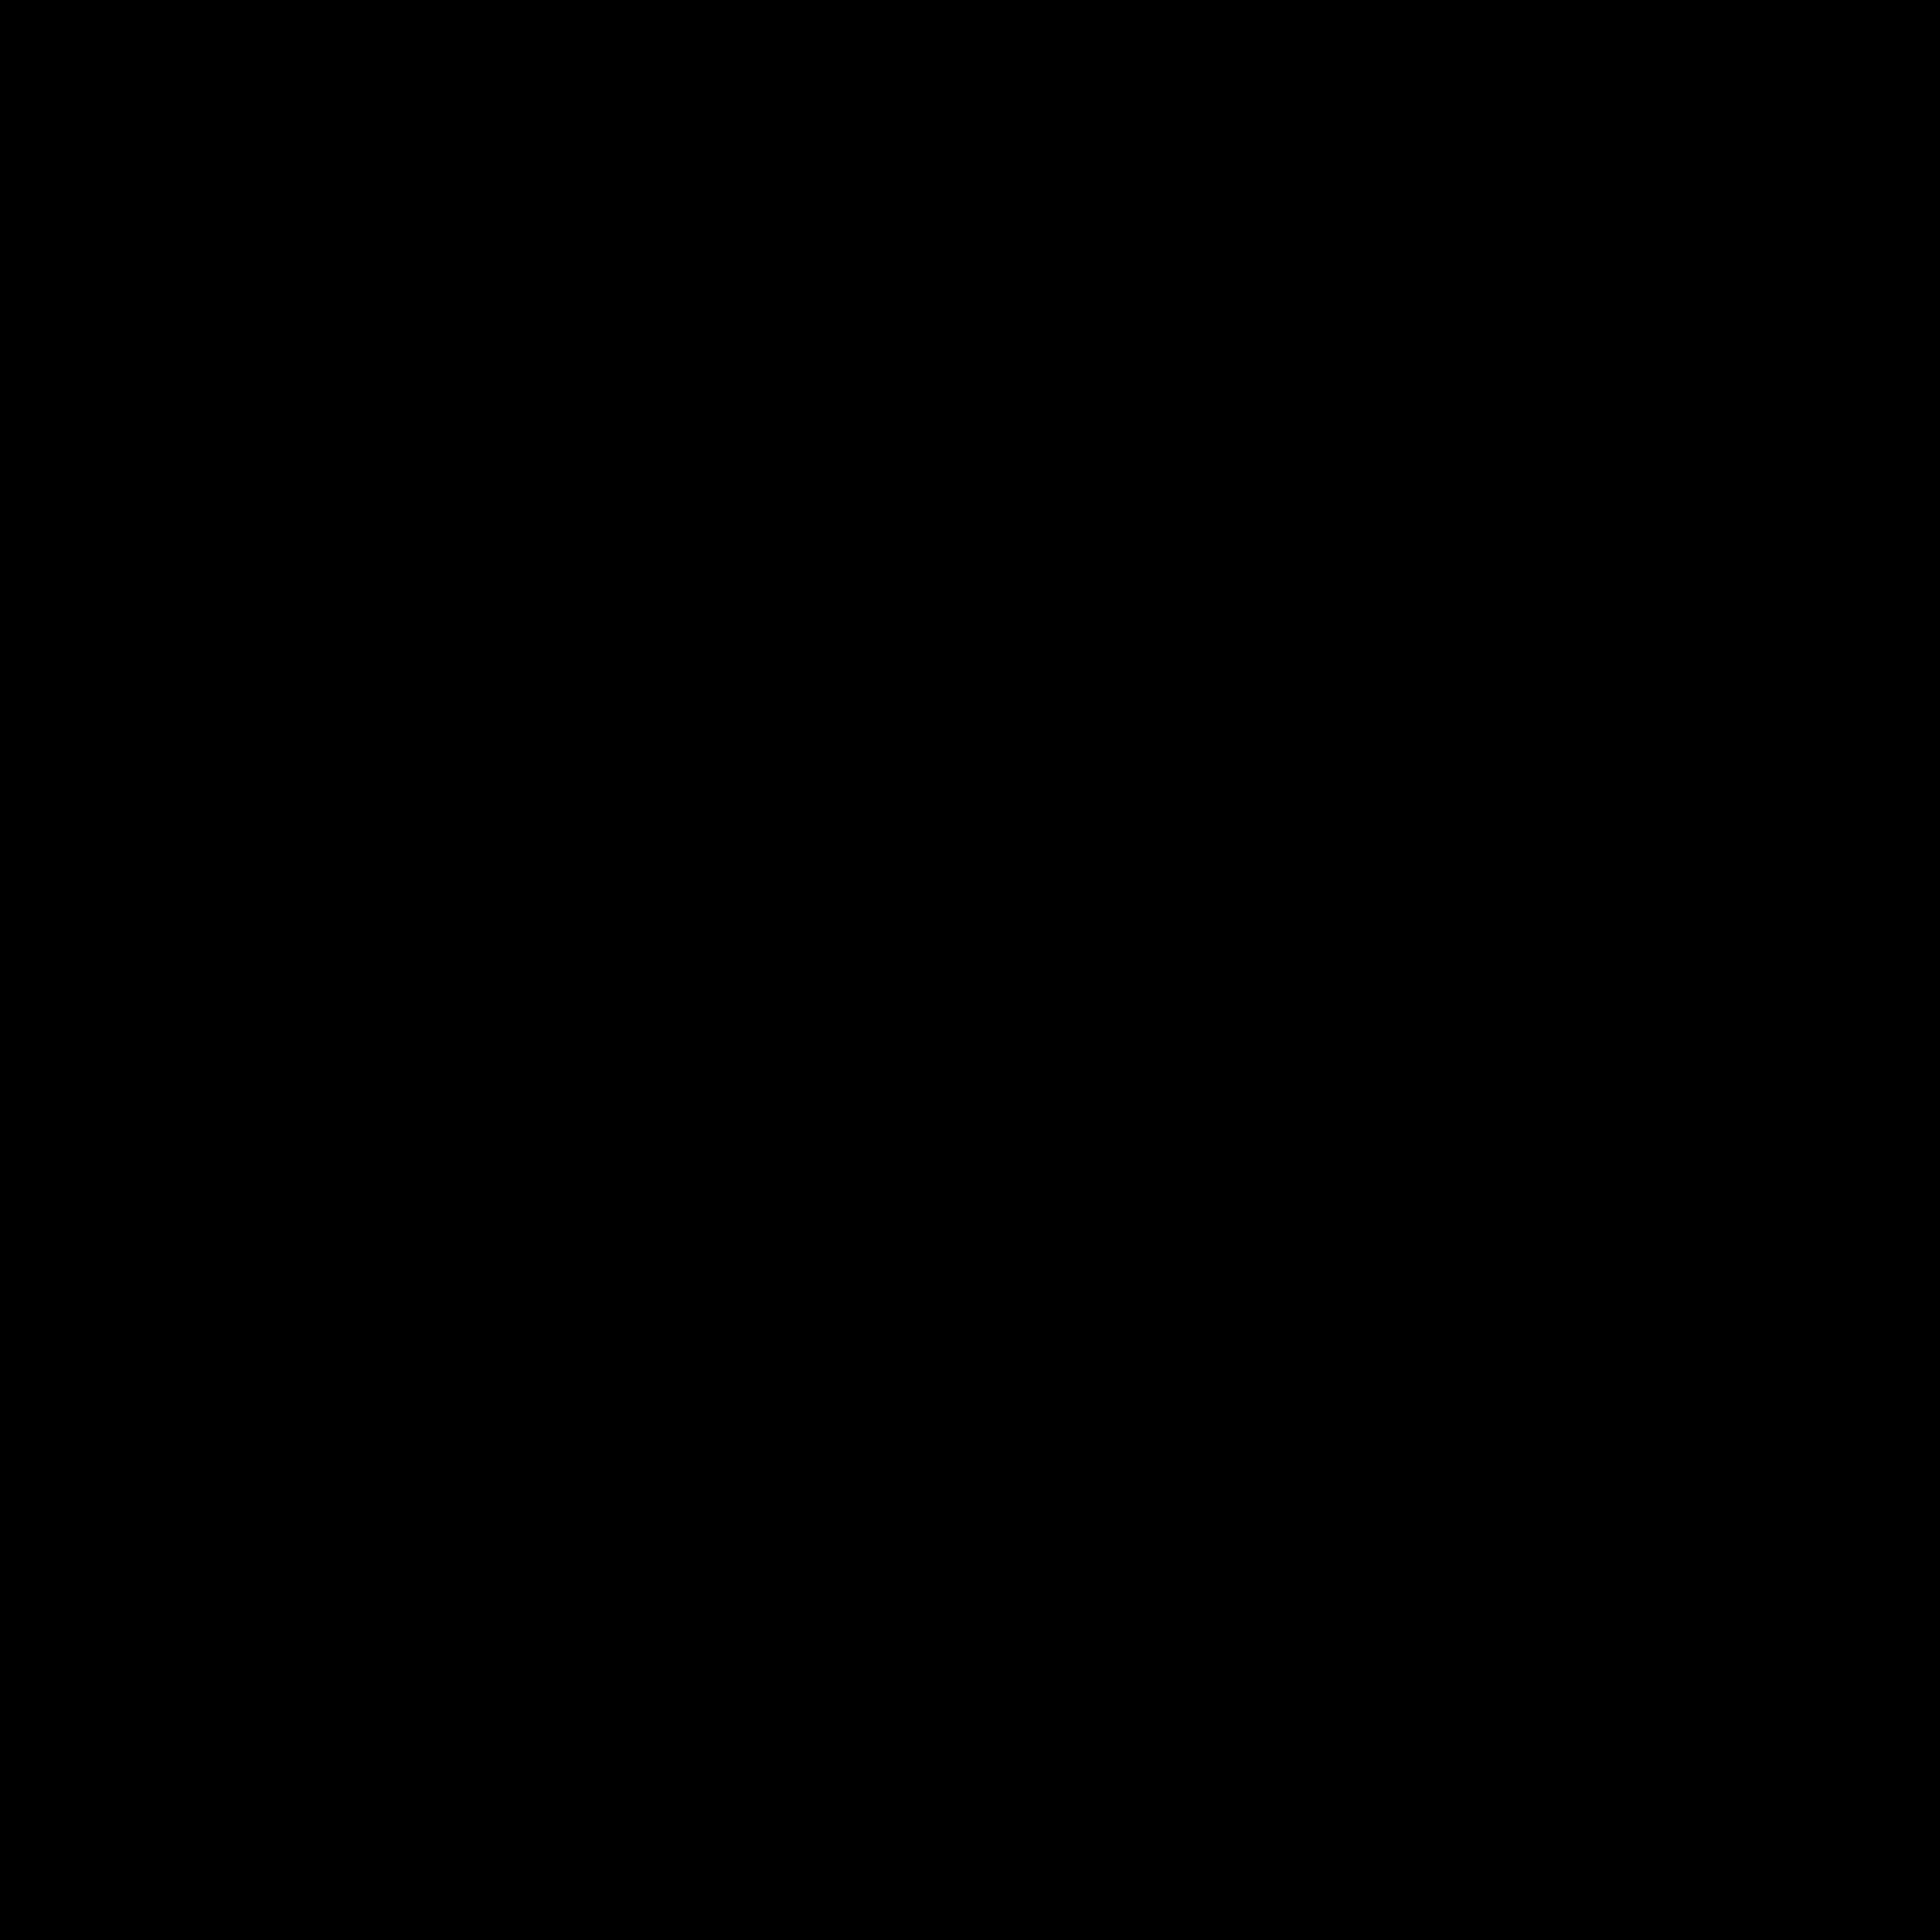 Discord icon